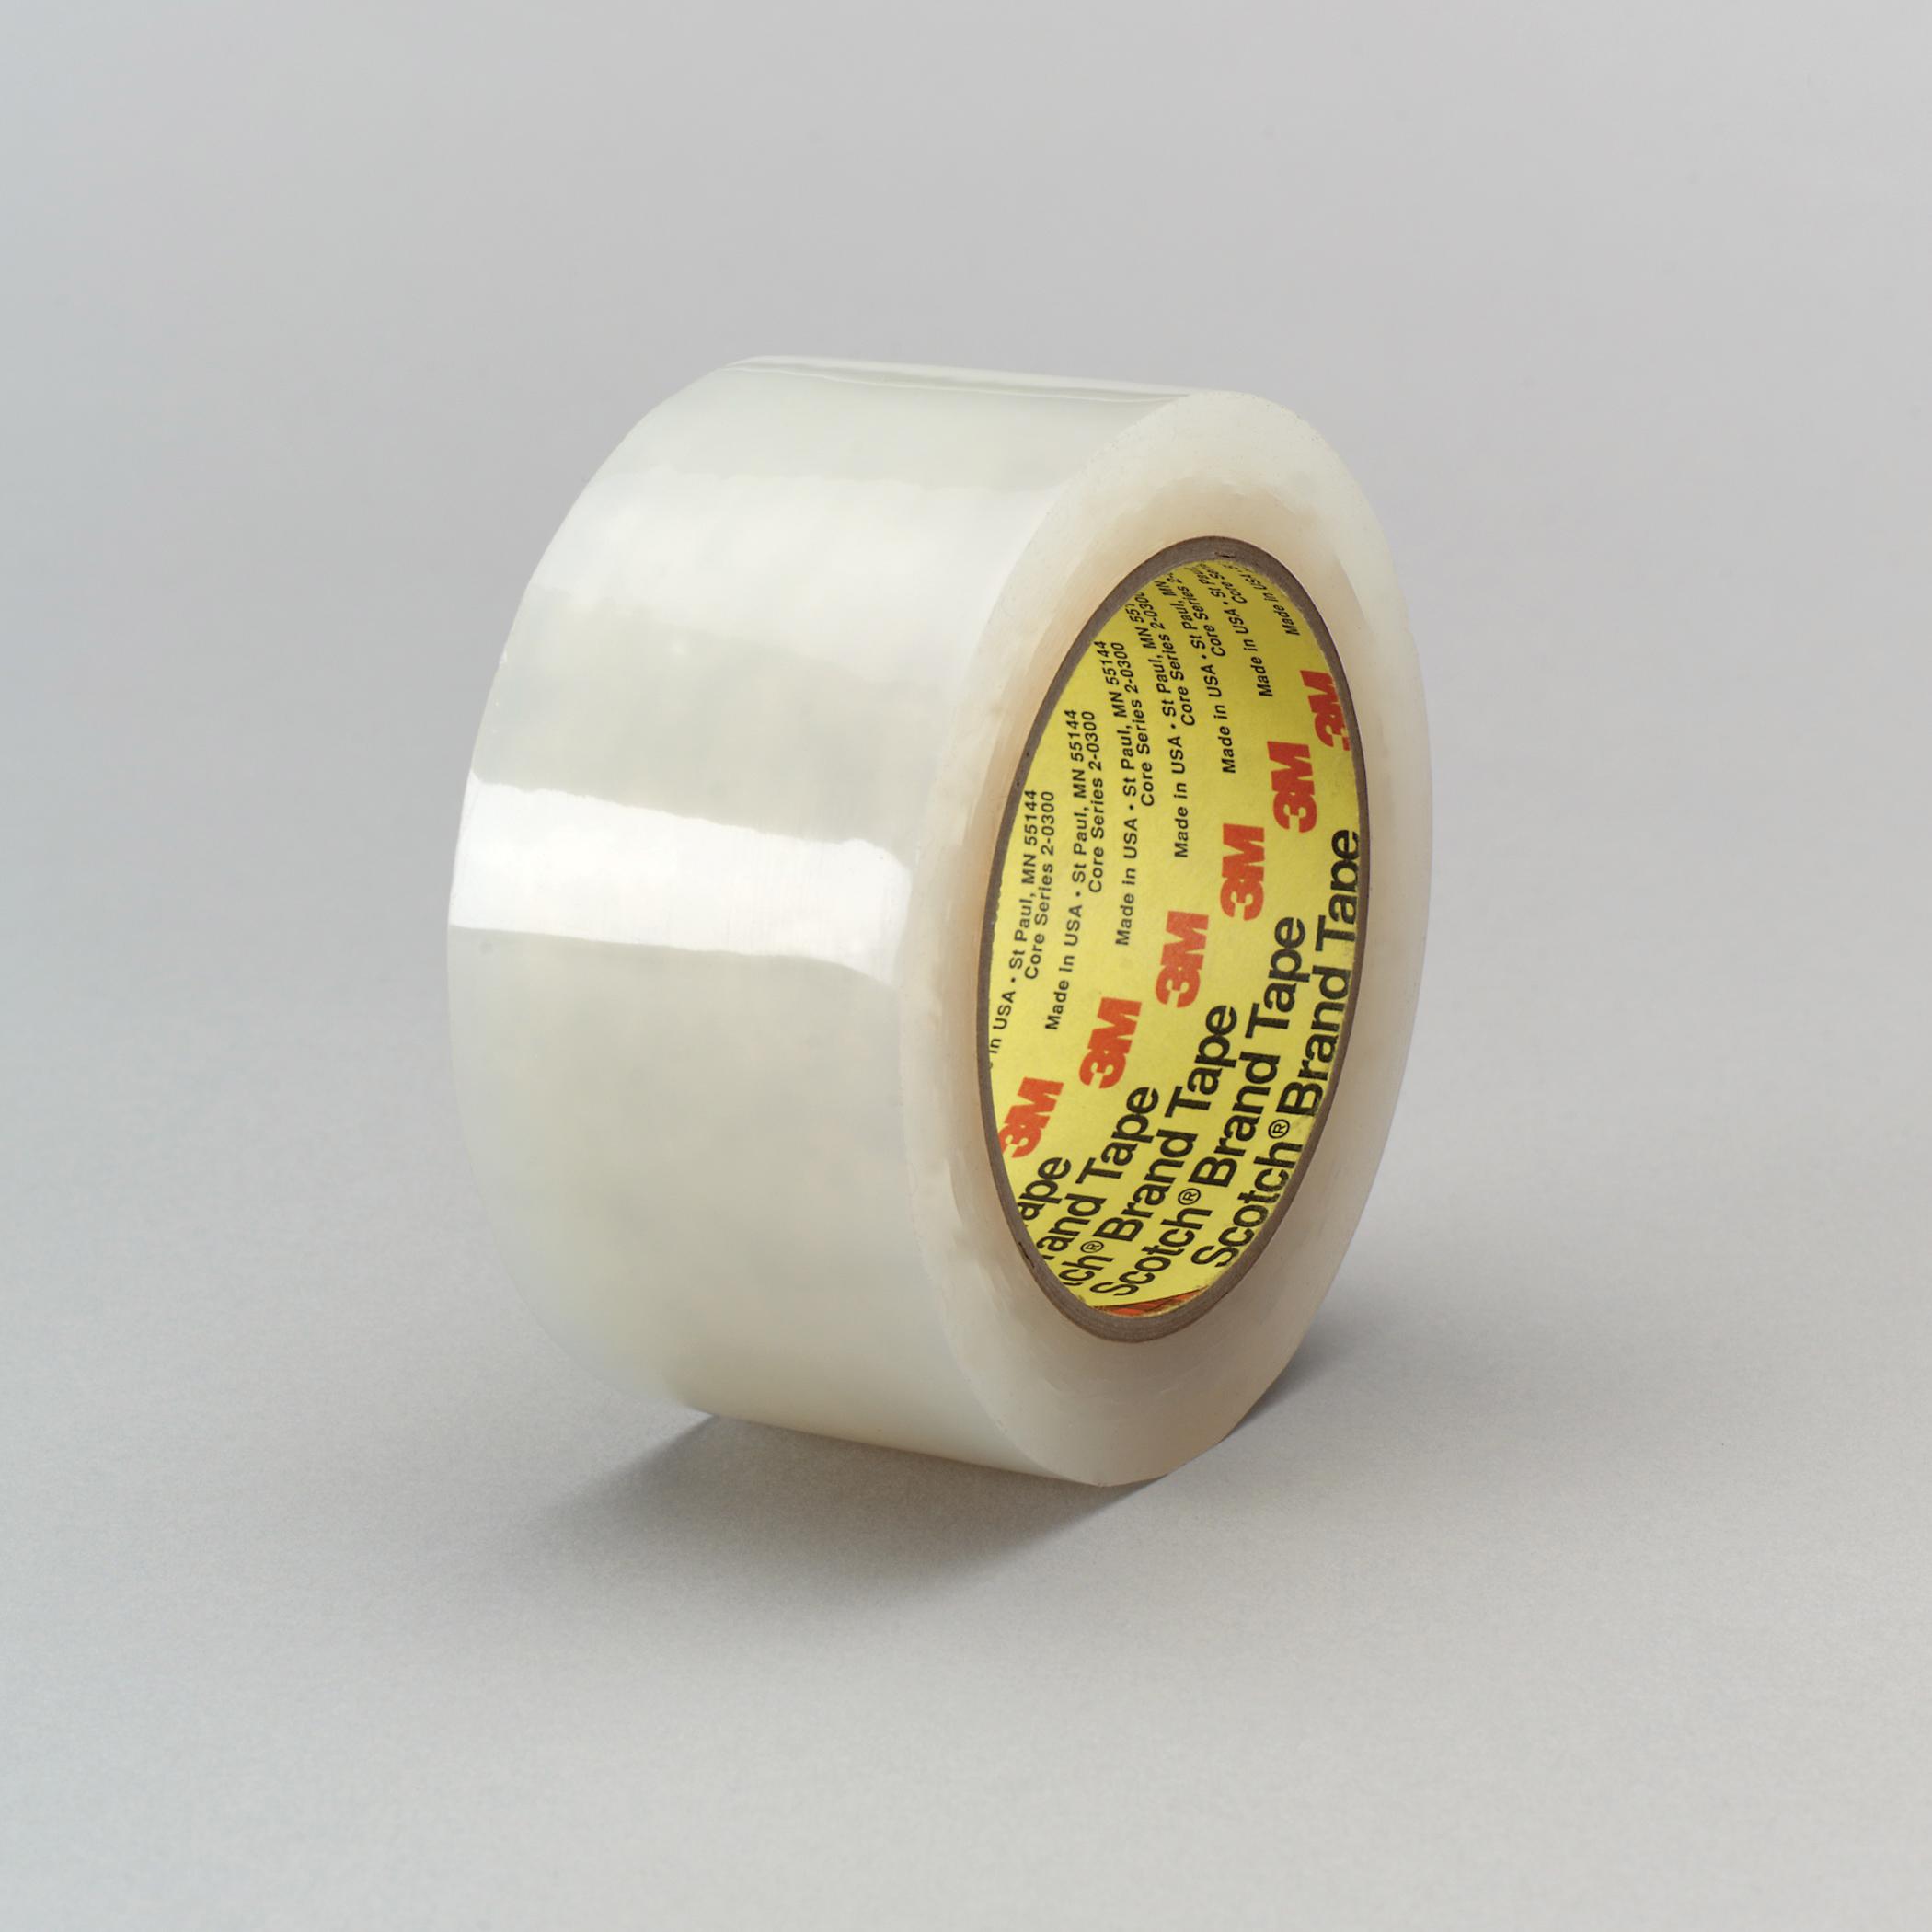 3M™ 021200-05151 Splicing Tape, 36 yd L x 2 in W, 5.1 mil THK, Acrylic Adhesive, Polyethylene Backing, Transparent